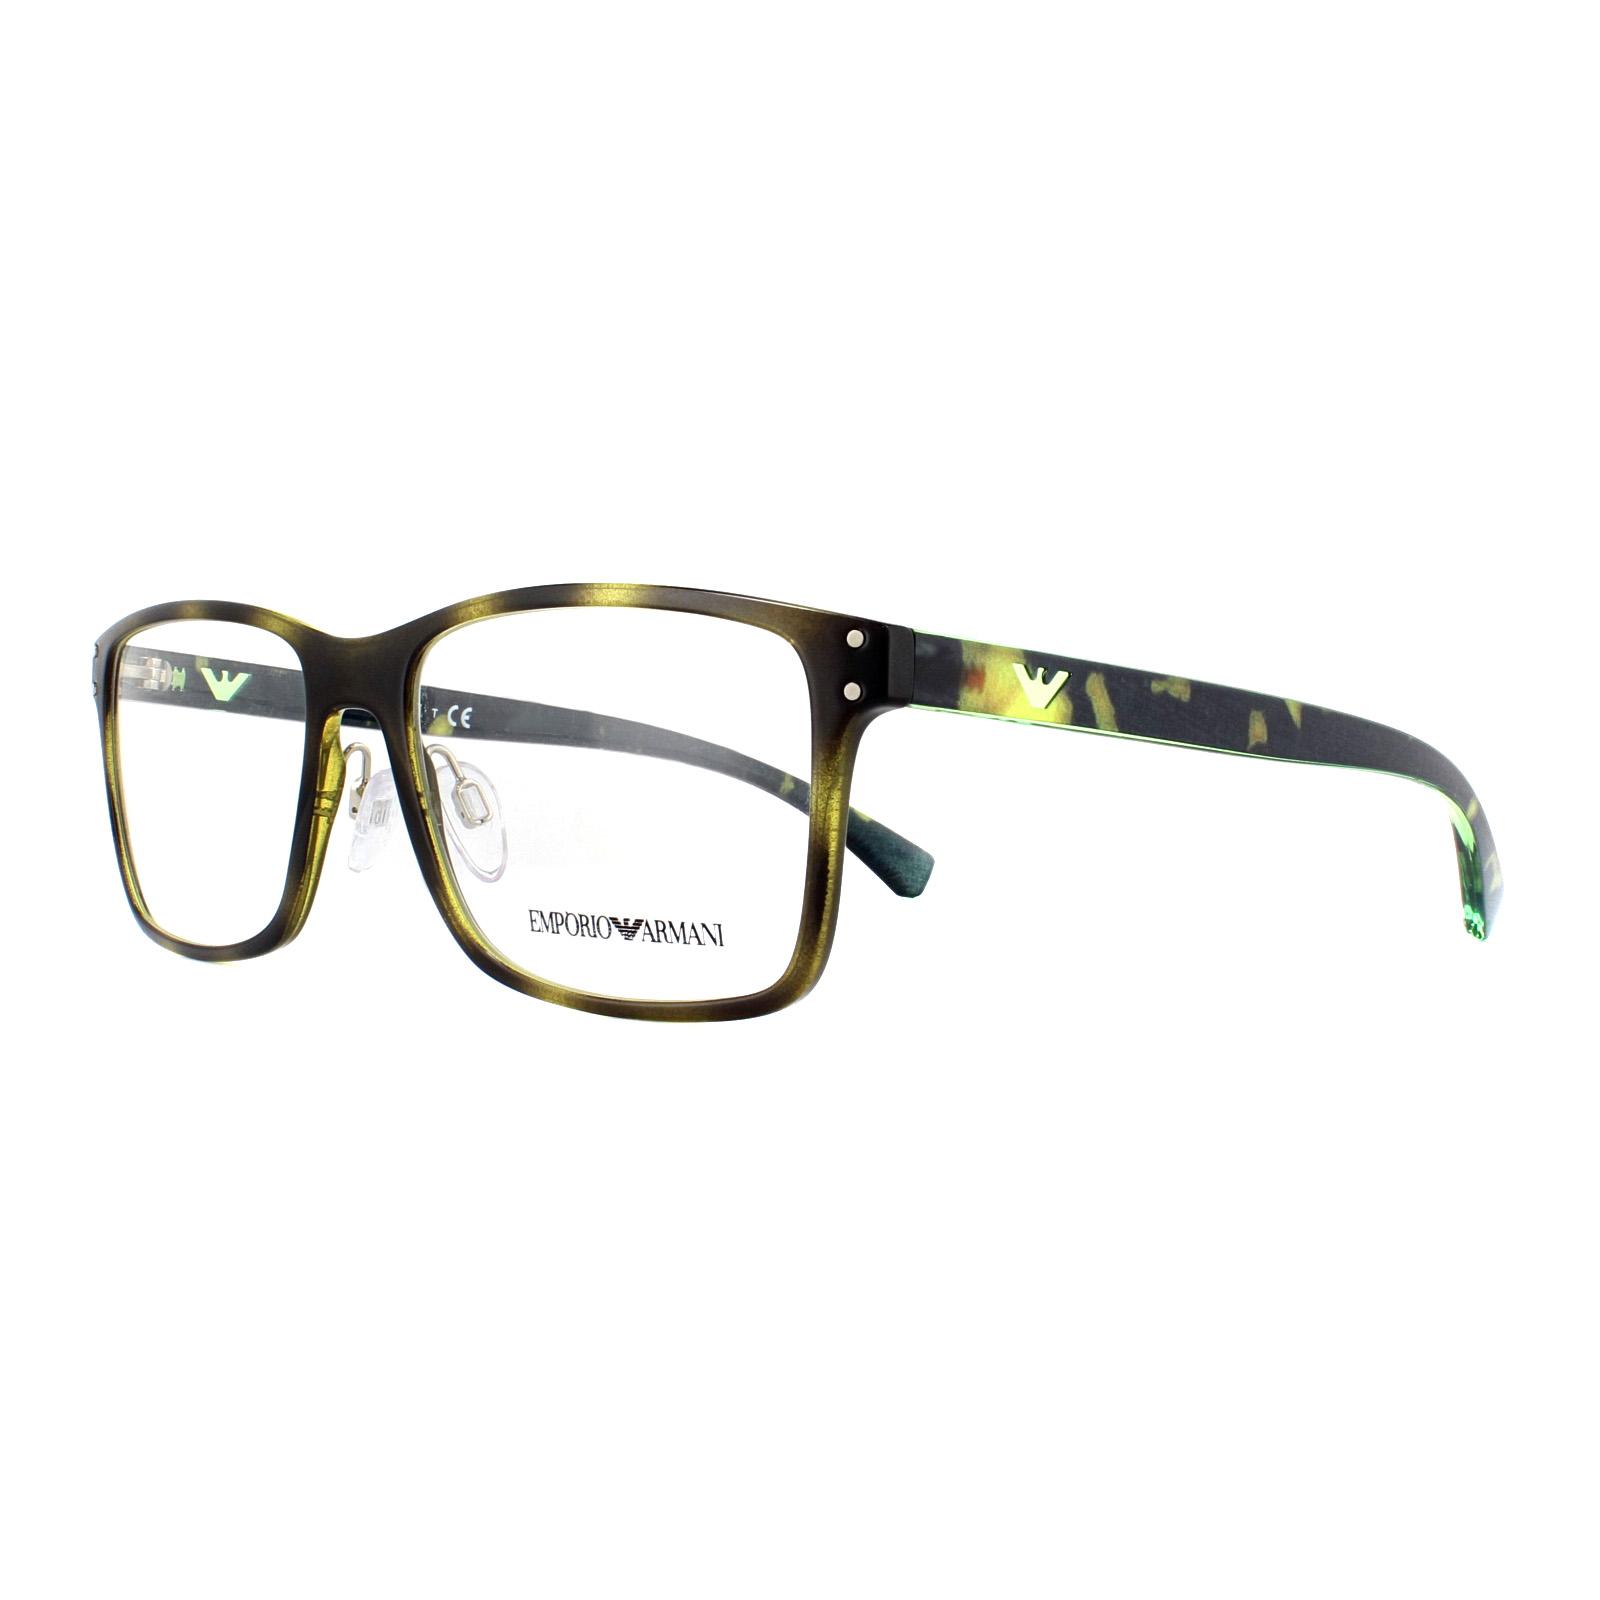 e802f0060d2e Sentinel Emporio Armani Glasses Frames EA 3114 5026 Havana 55mm Mens